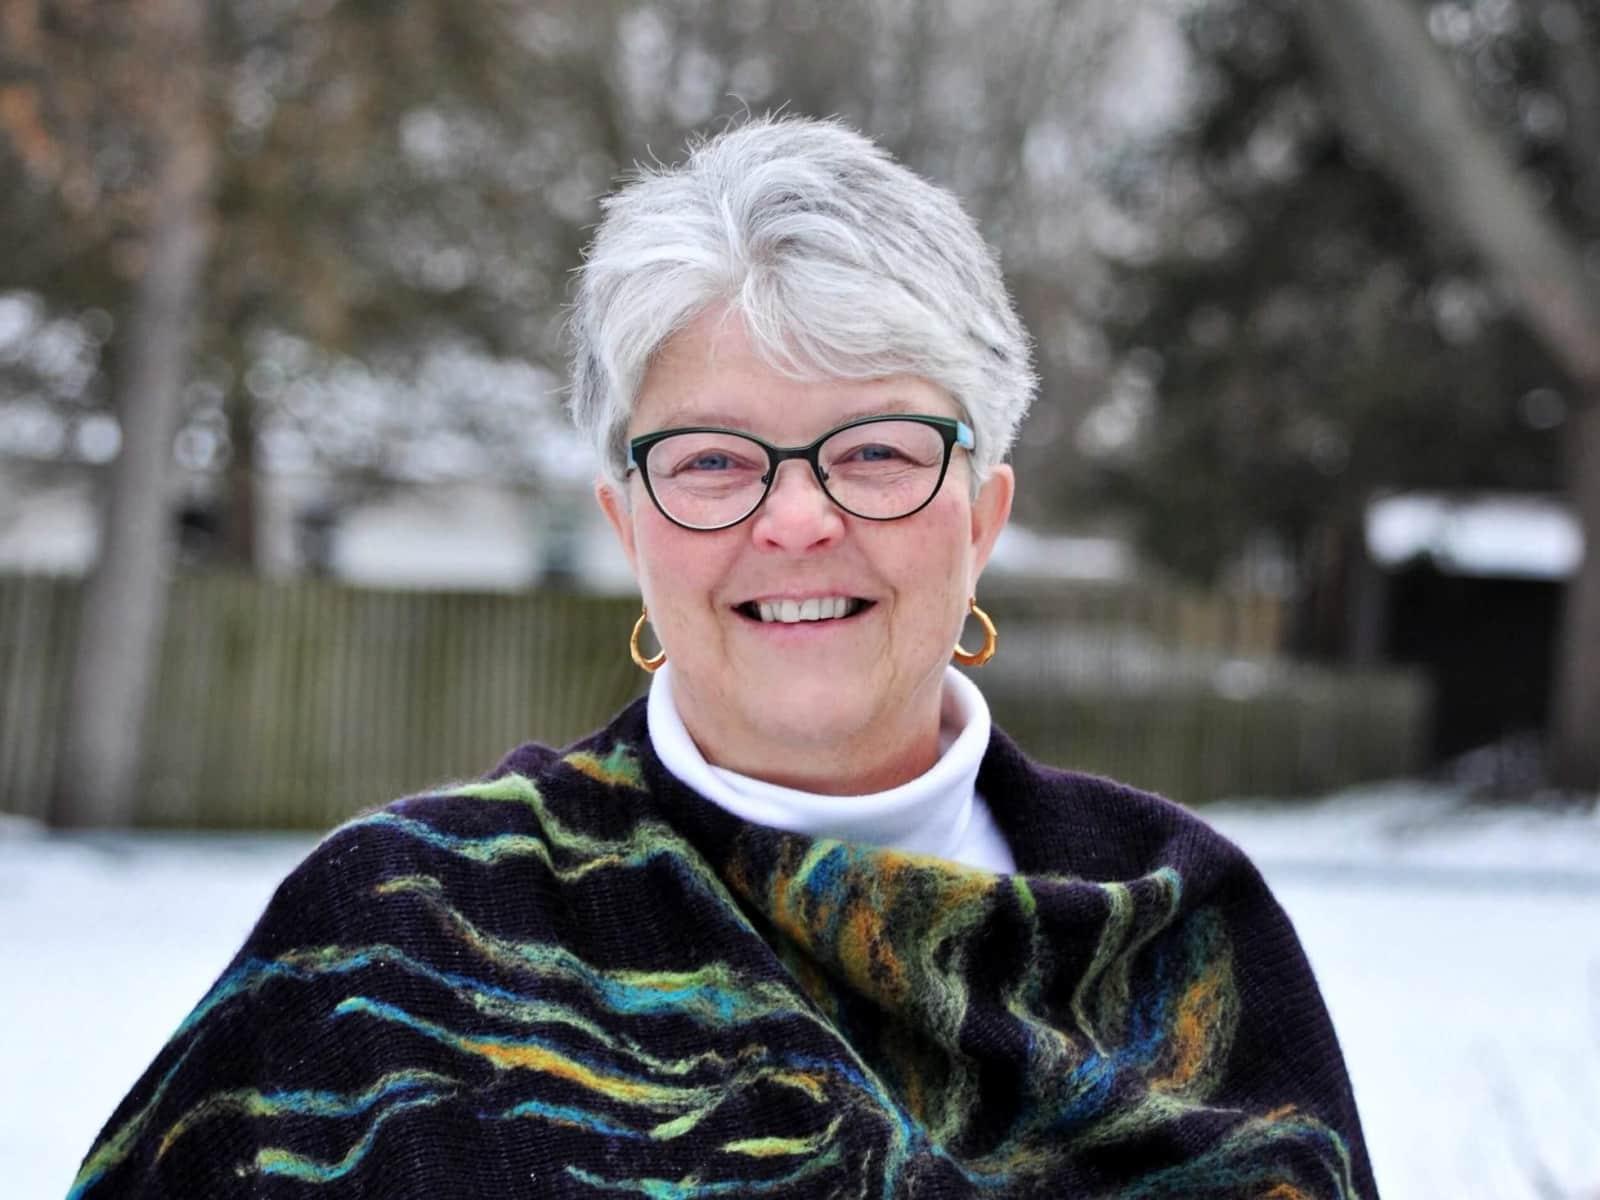 Doris from Kalamazoo, Michigan, United States